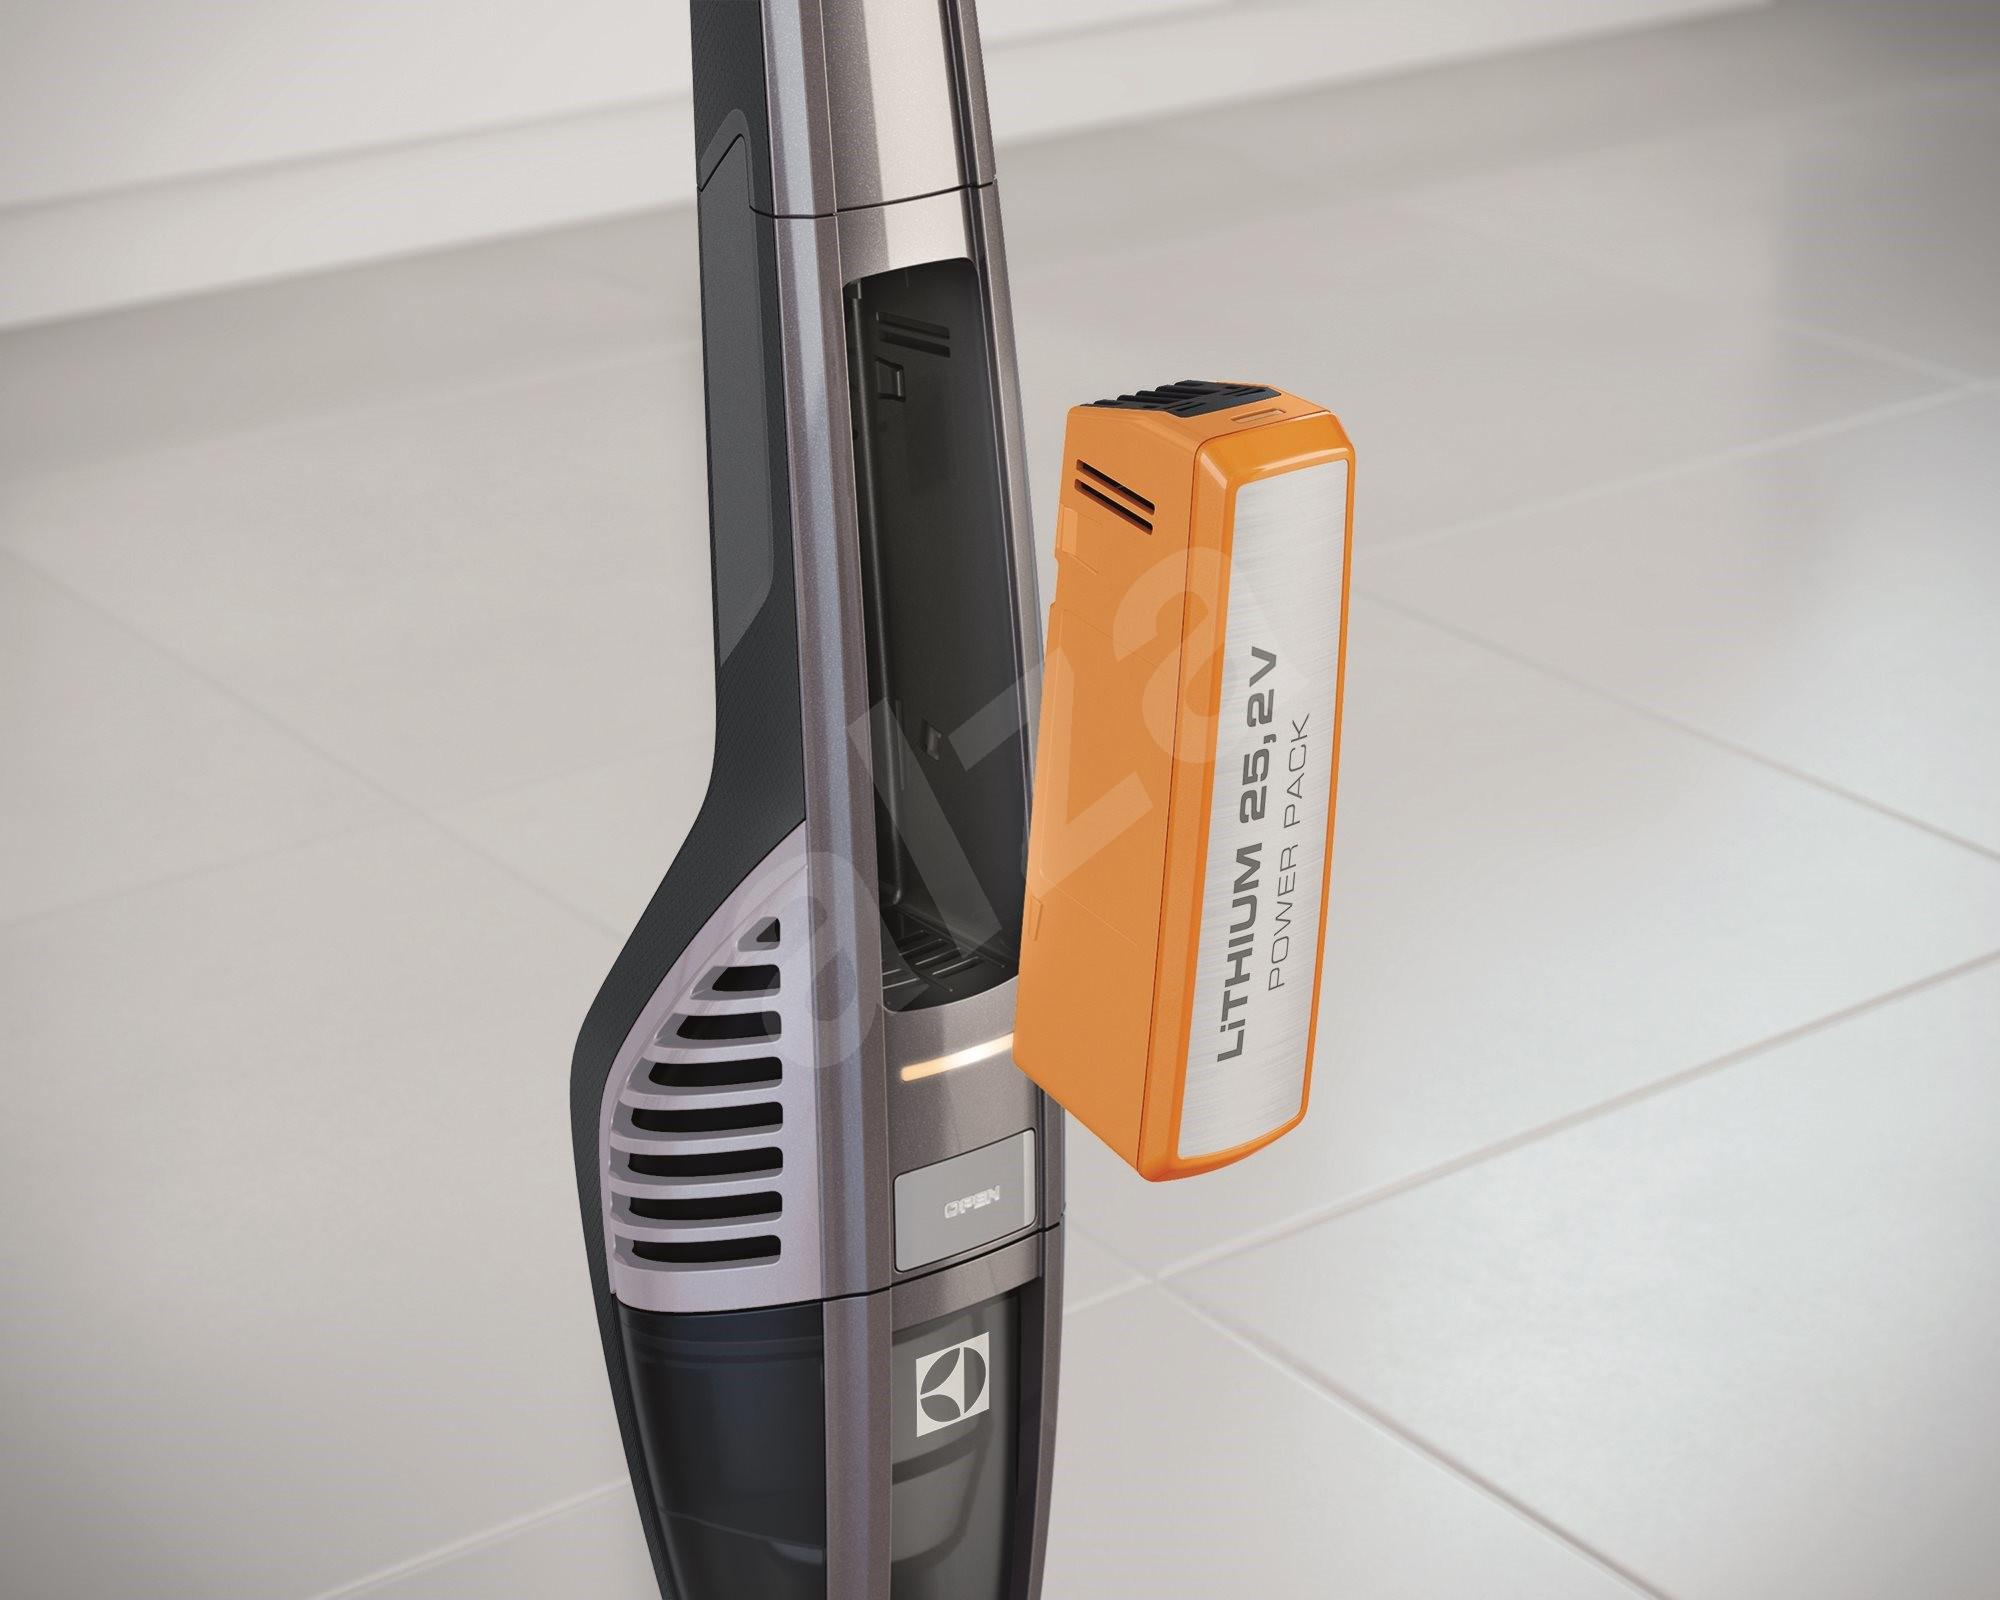 Electrolux Ultrapower Zb5022 Cordless Stick Vacuum